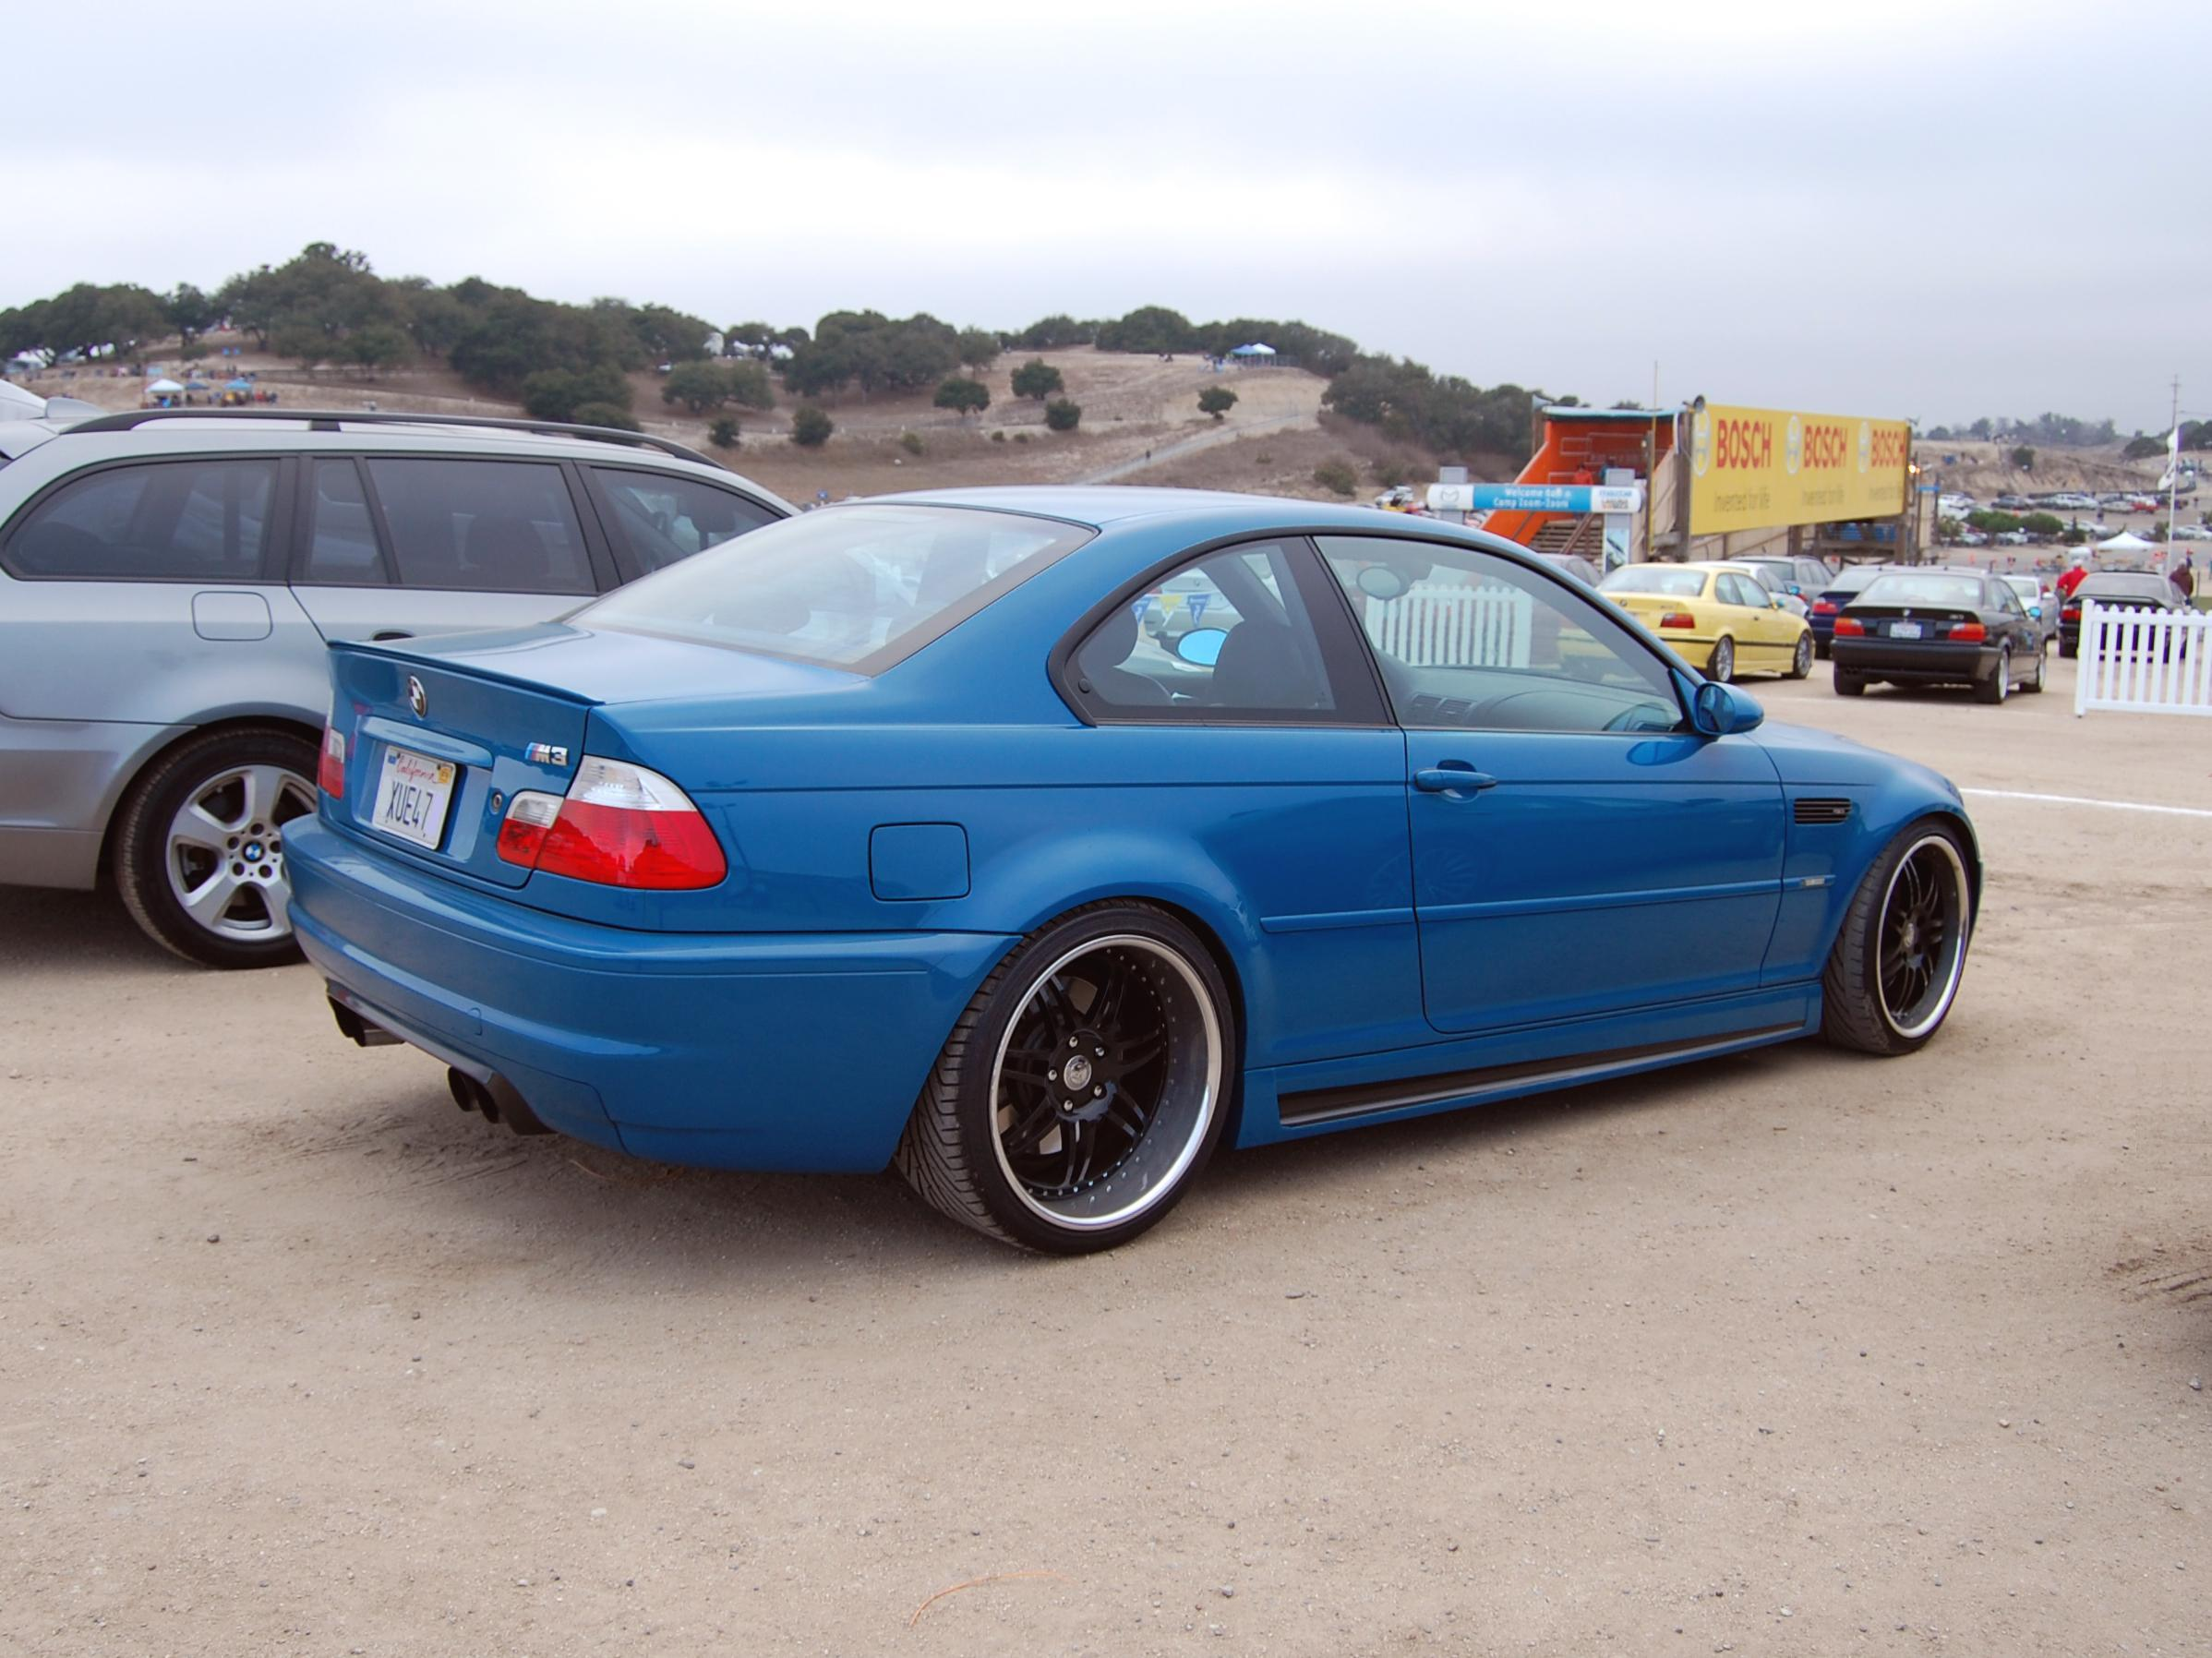 BMW_M3_E46_Laguna_Seca_Blue_by_Partywave.jpg